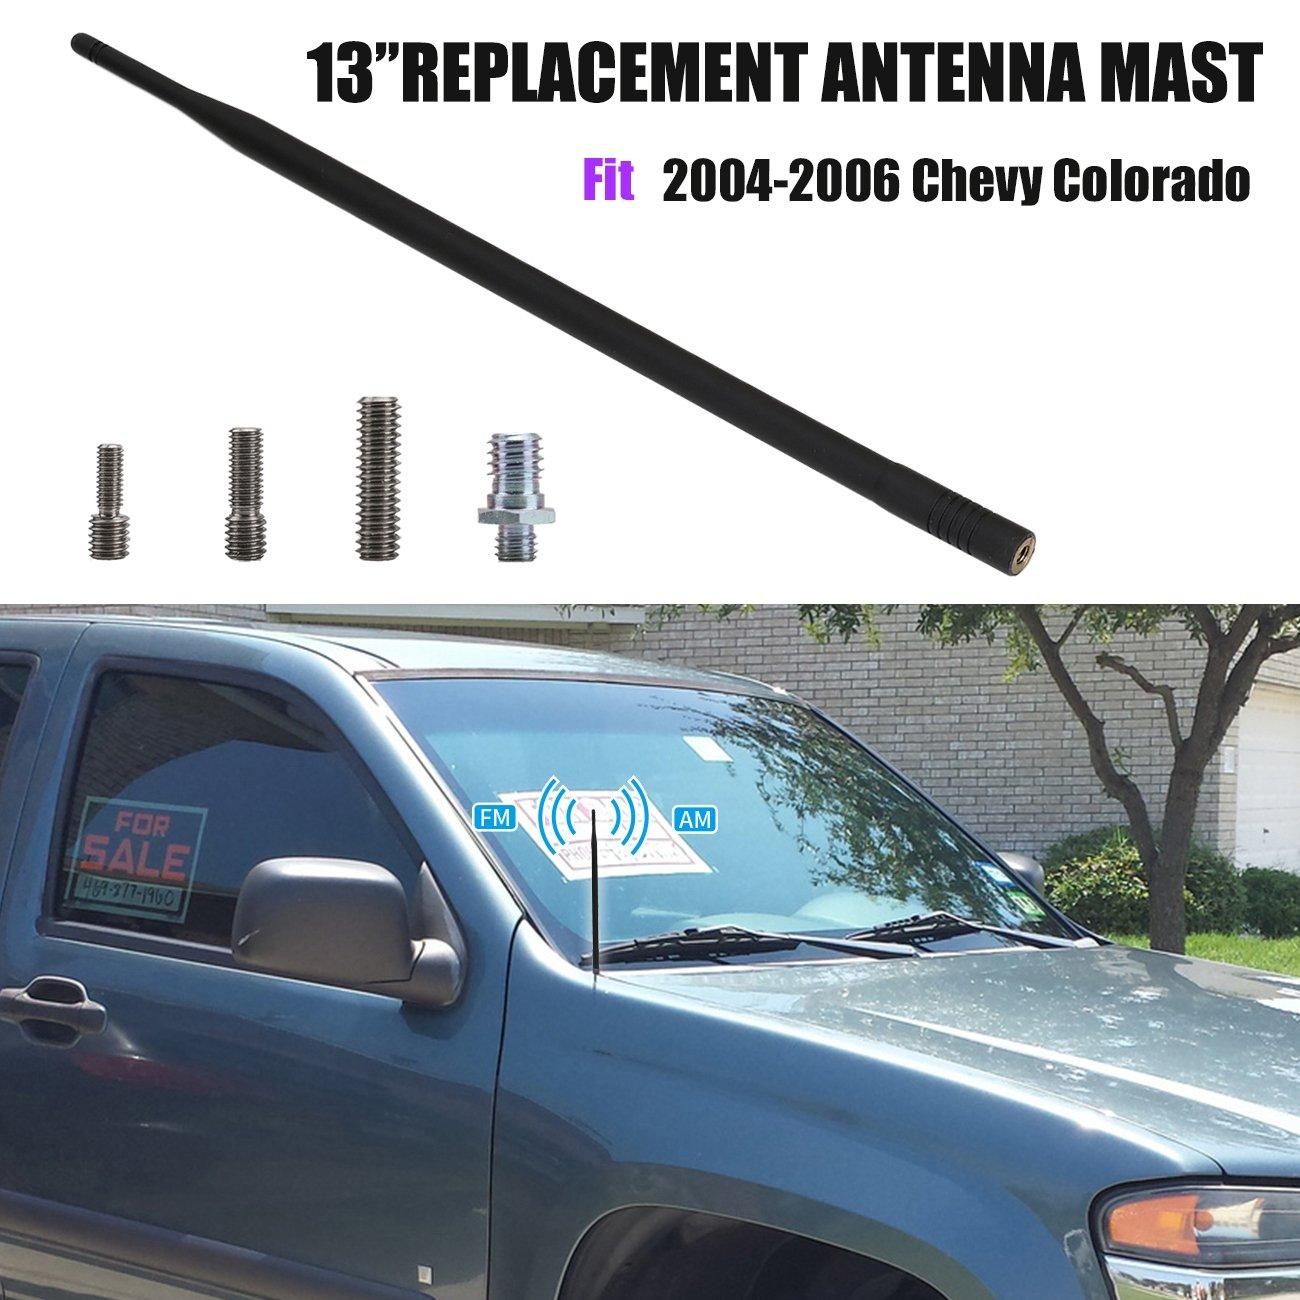 for Chevy Colorado 2004 2005 2006 - 13